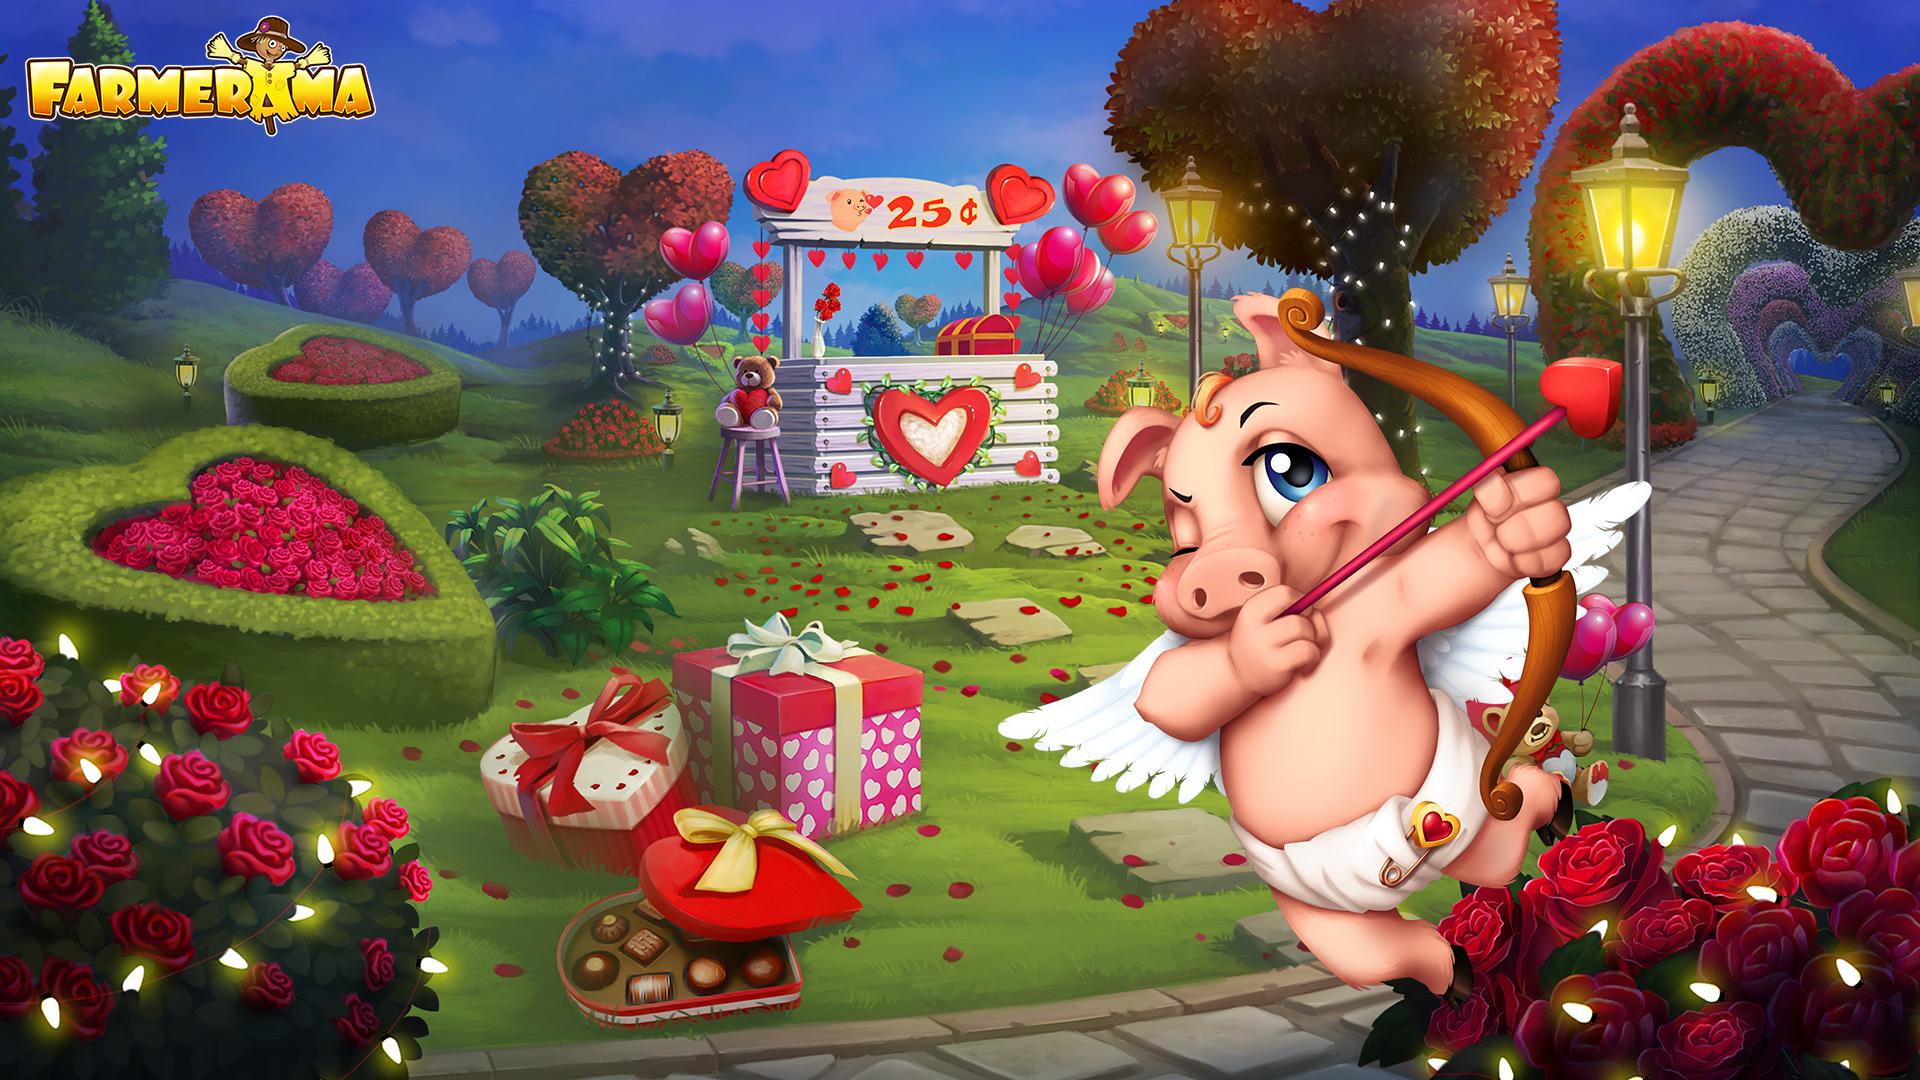 valentines2018_wallpaper_character.jpg